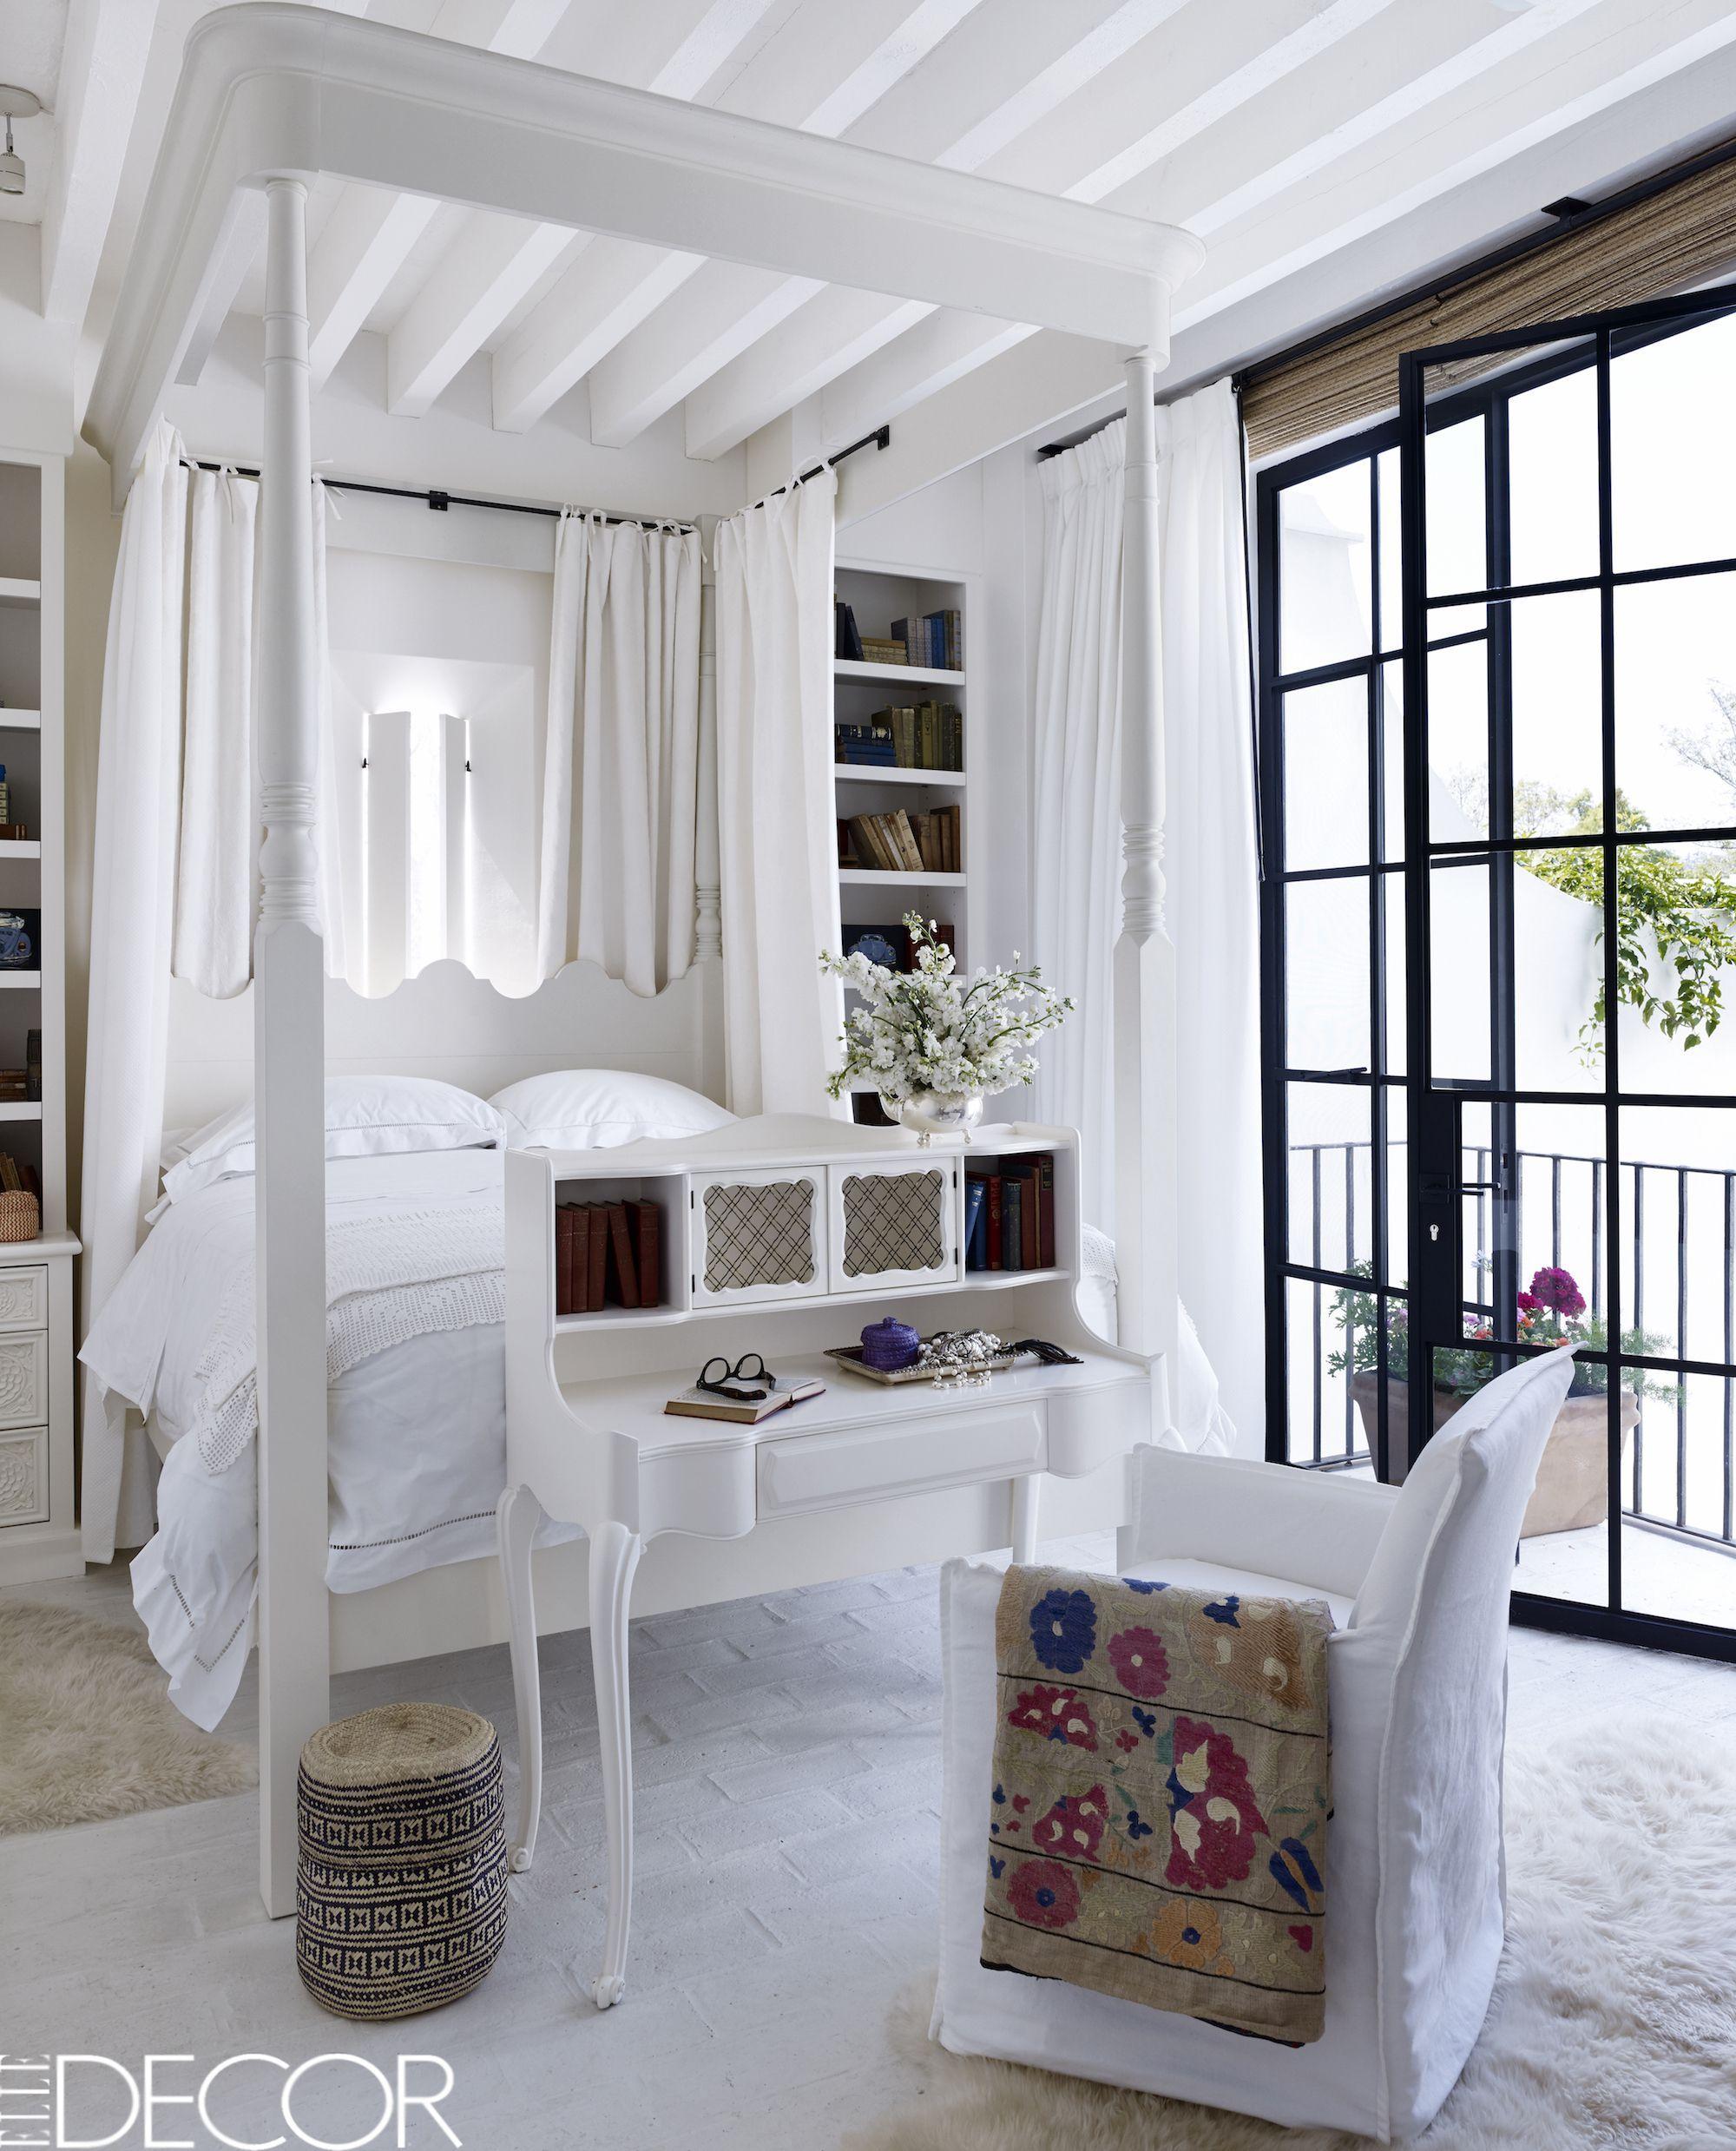 Tiny Bedrooms: 43 Small Bedroom Design Ideas